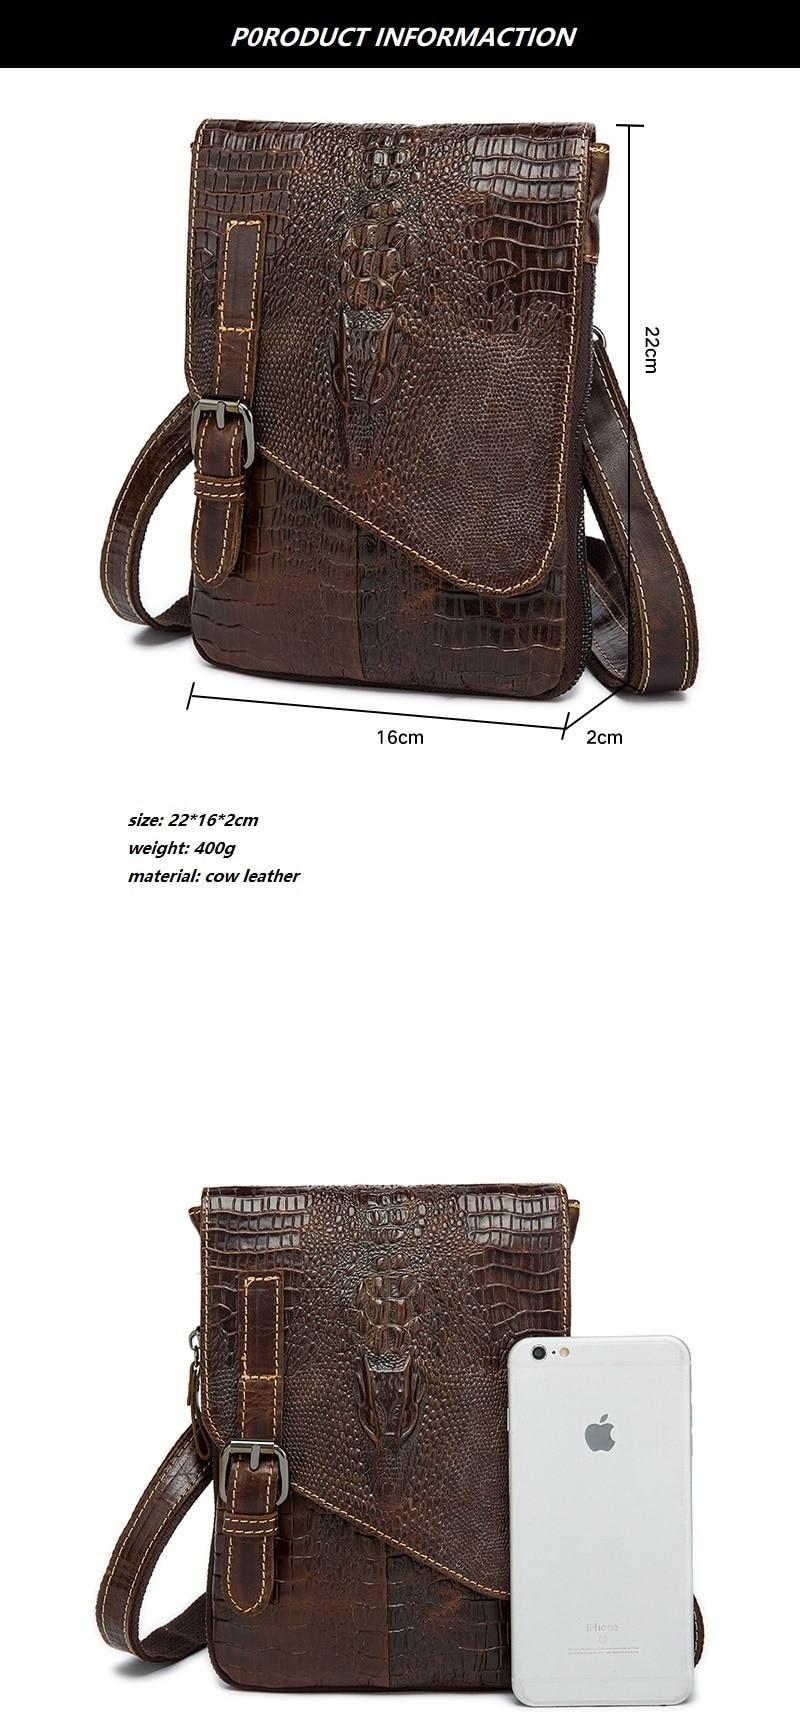 HTB1QwK lYYI8KJjy0Faq6zAiVXai Men Crocodile Classic Briefcase Genuine Leather Business Office Ipad Bag Lawyer Handbag Portfolio Satchel Alligator Shoulder bag